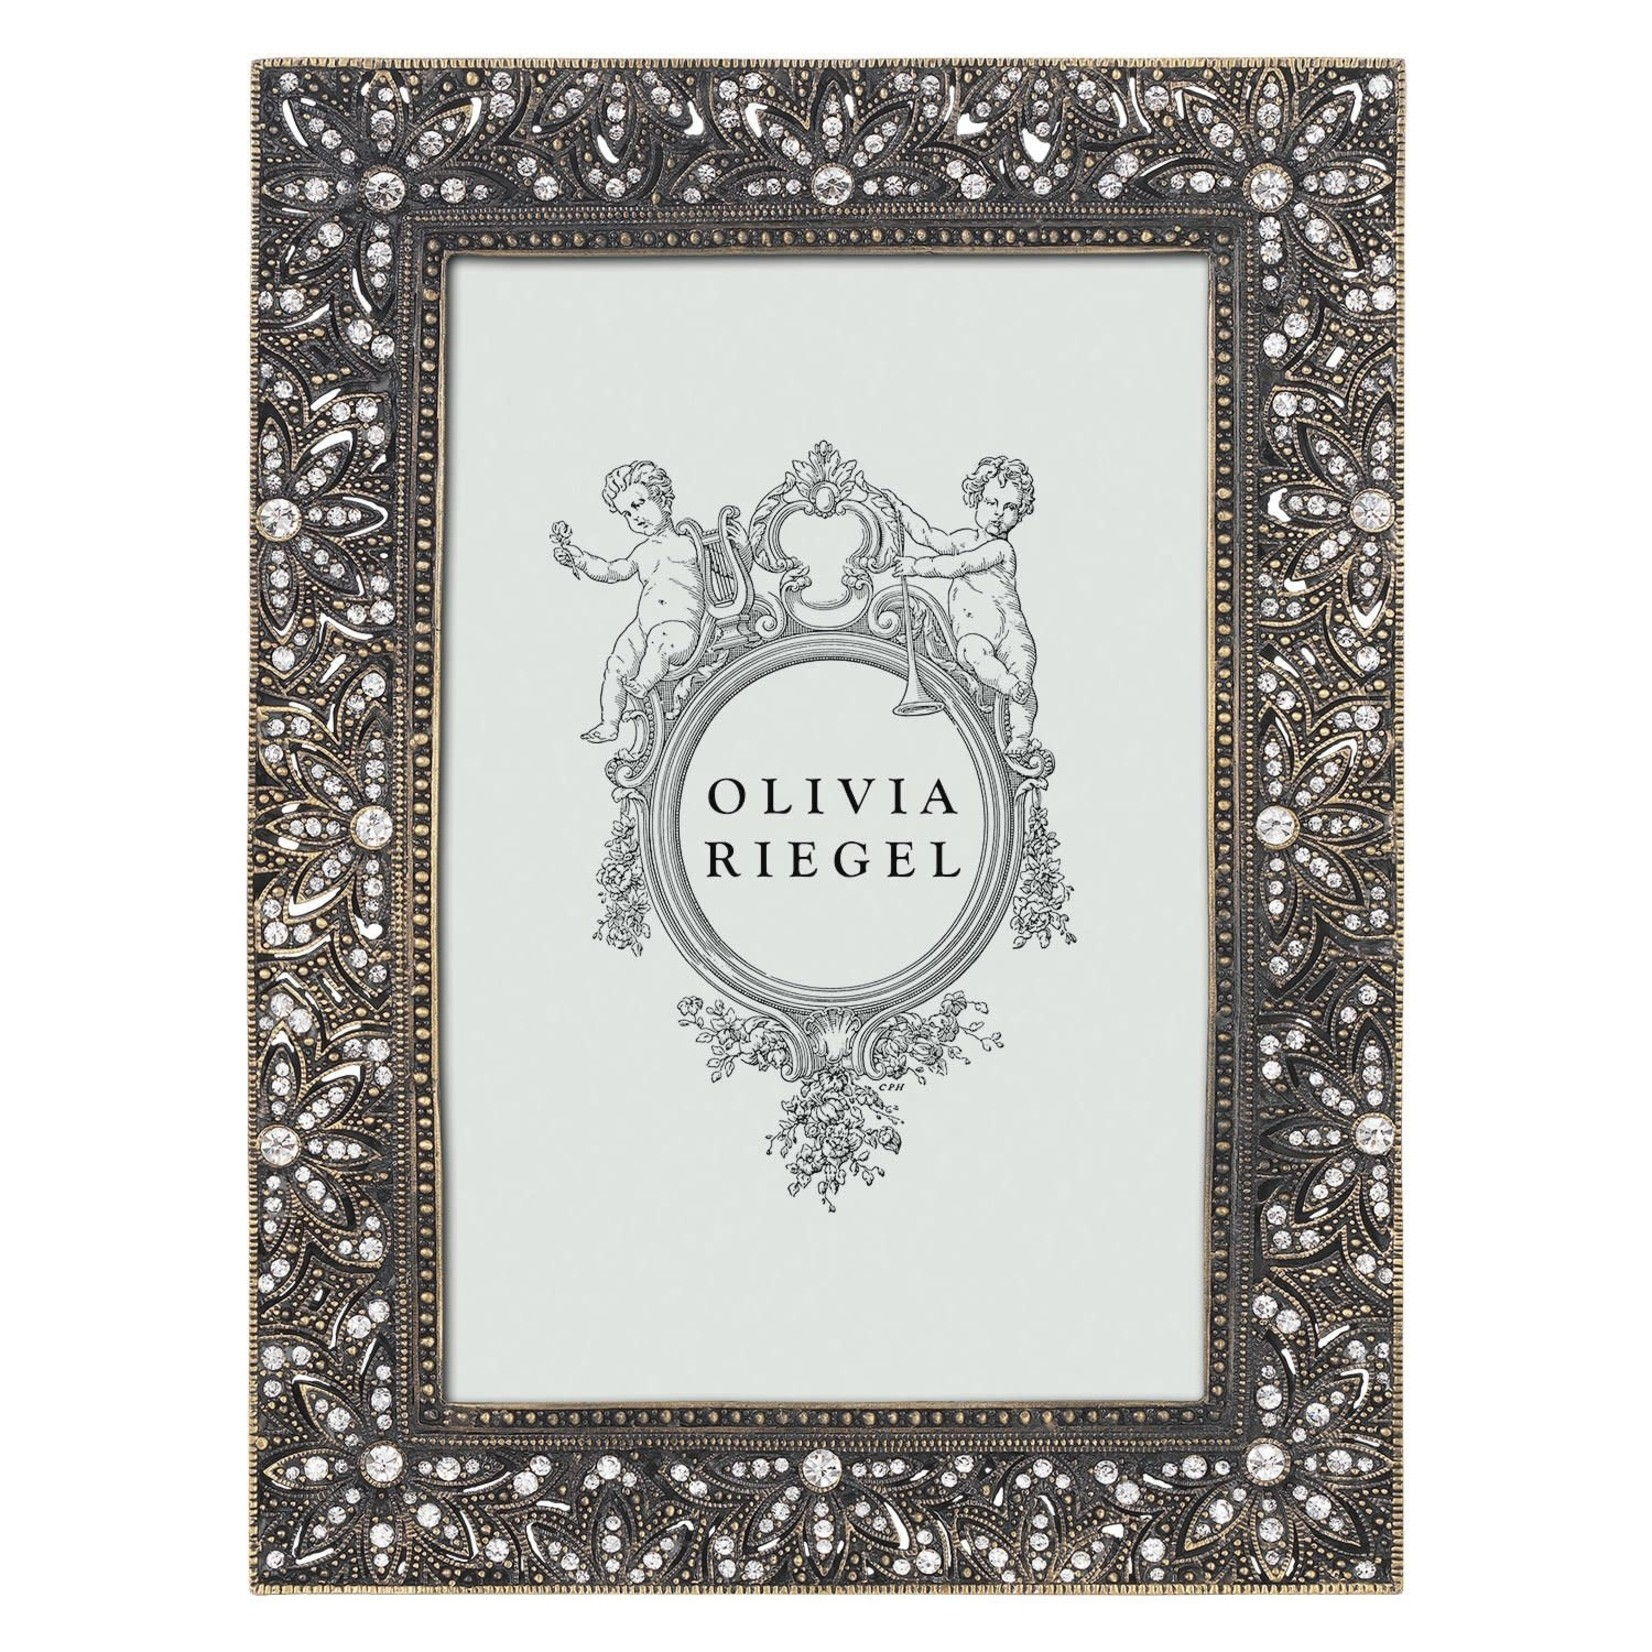 "Olivia Riegel Bronze Windsor 4"" x 6"" Frame"